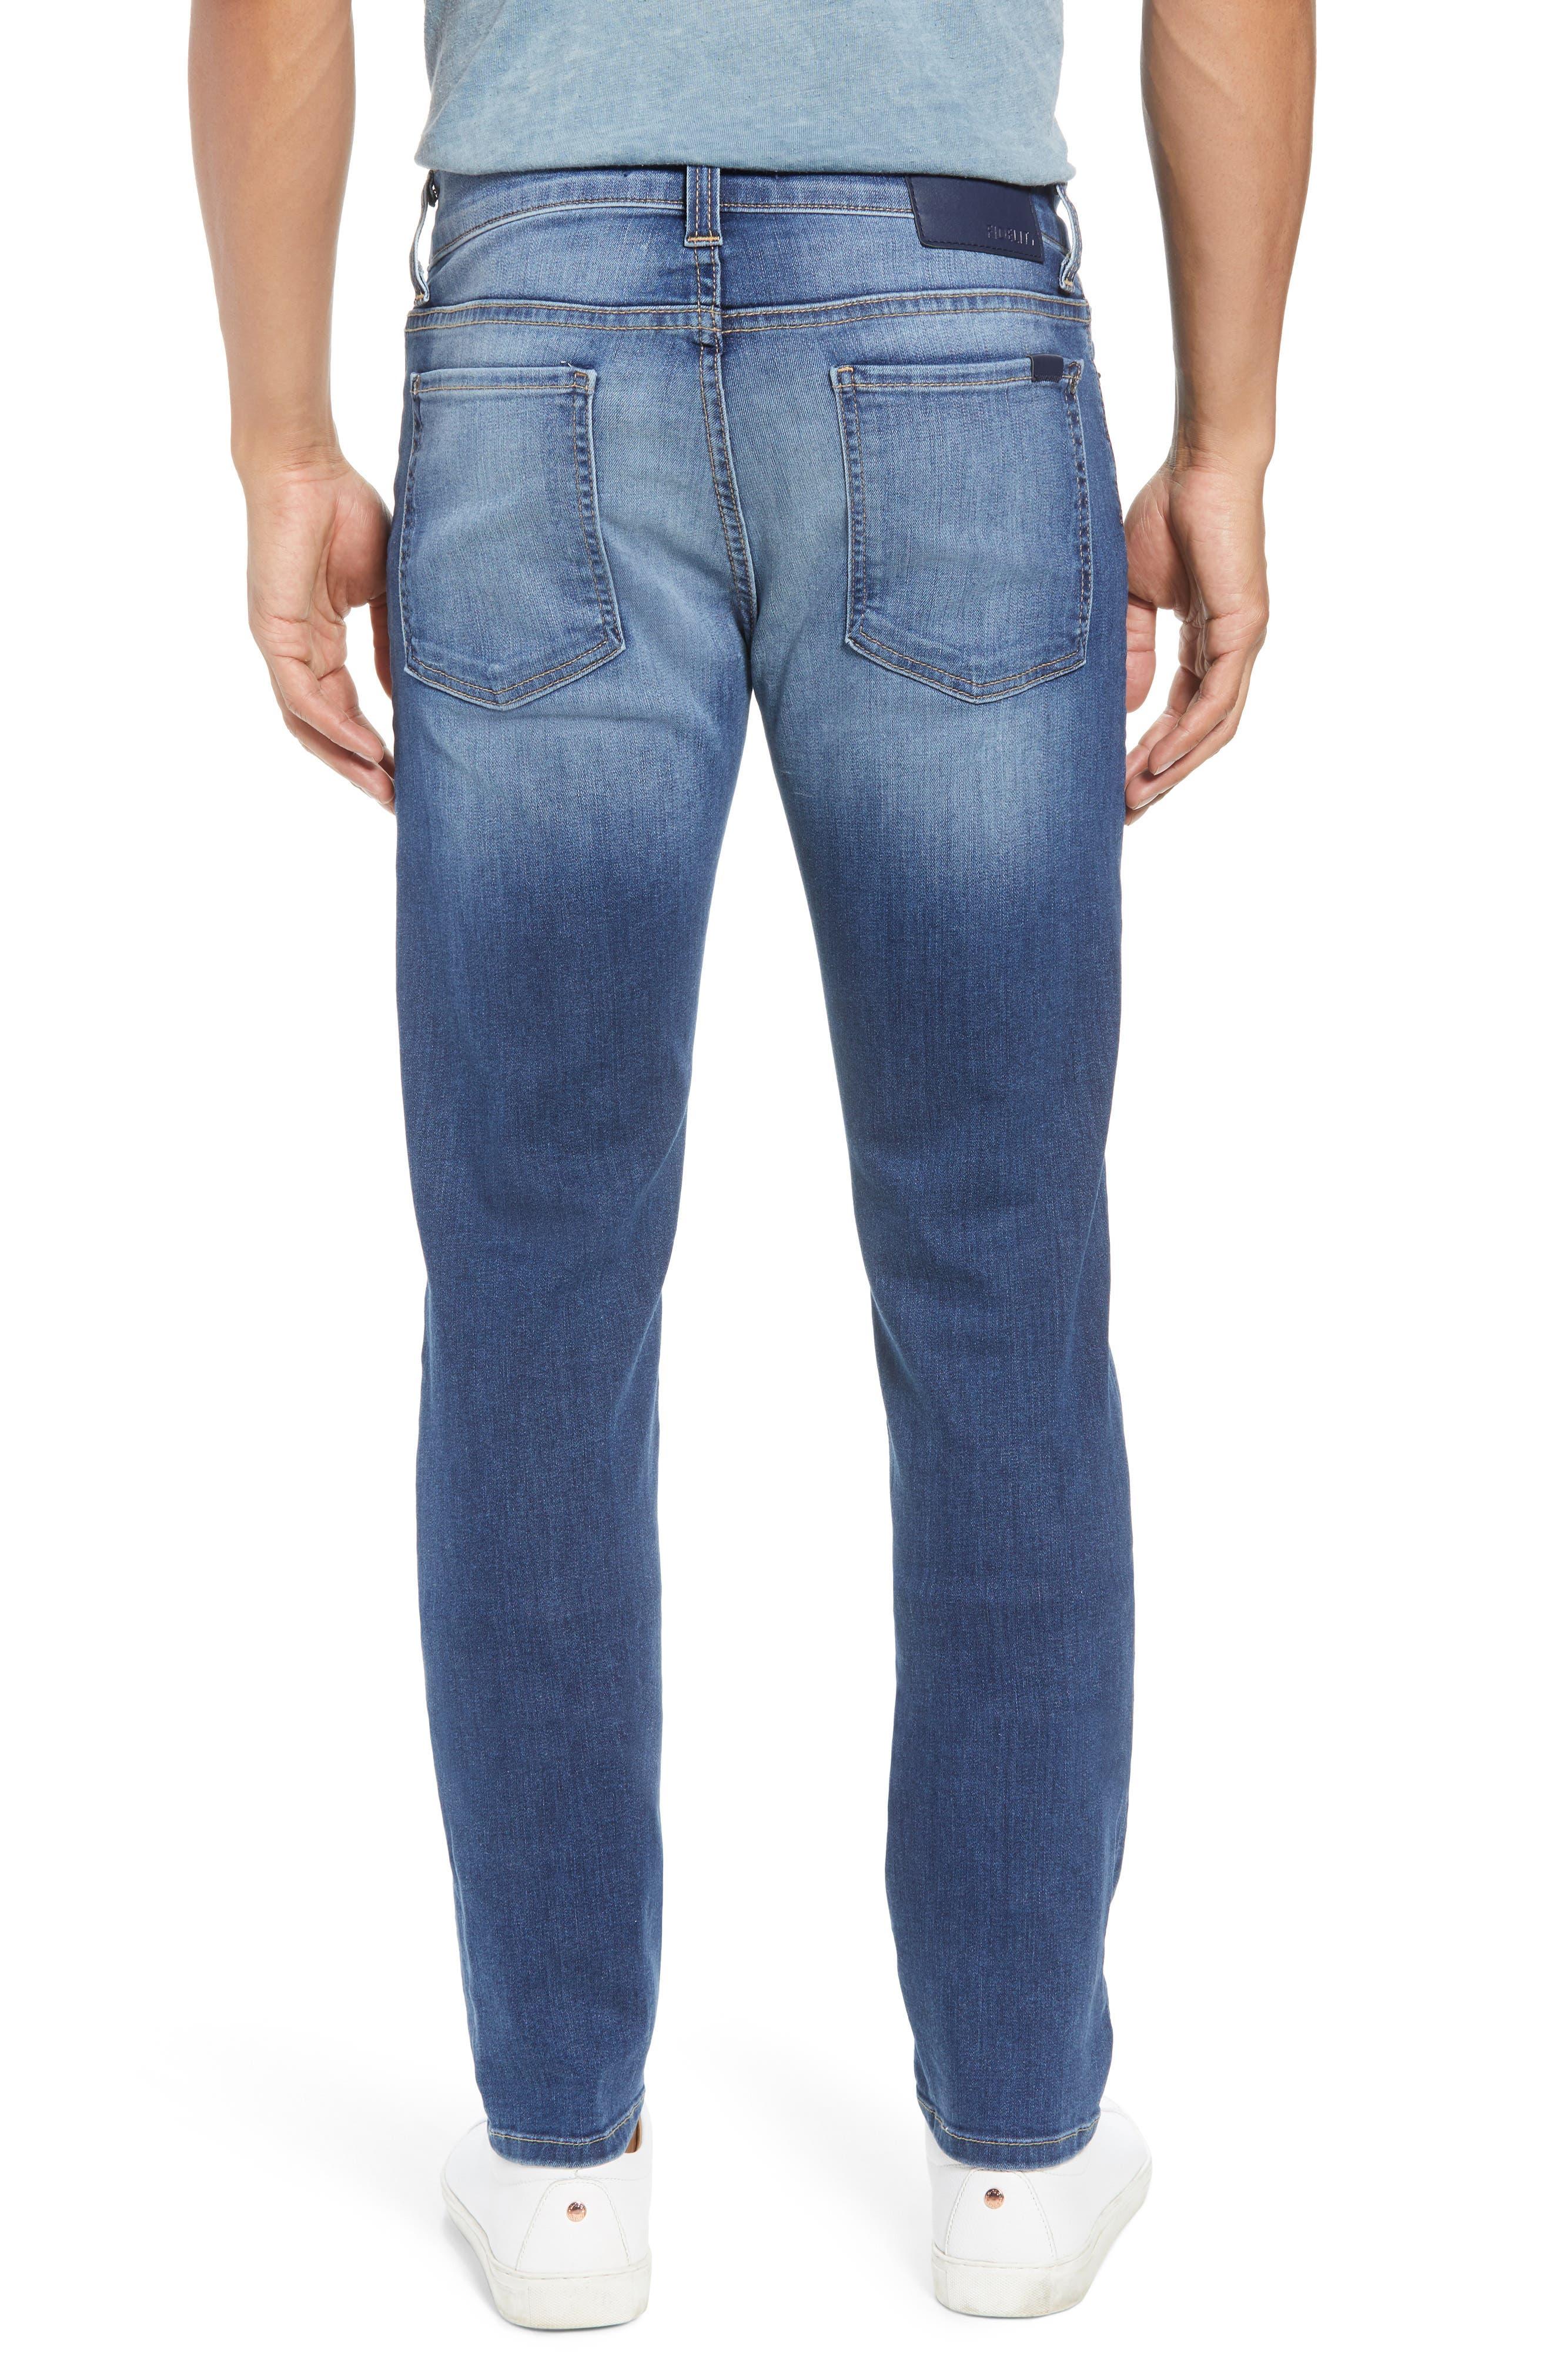 Torino Slim Fit Jeans,                             Alternate thumbnail 2, color,                             Elysium Blue